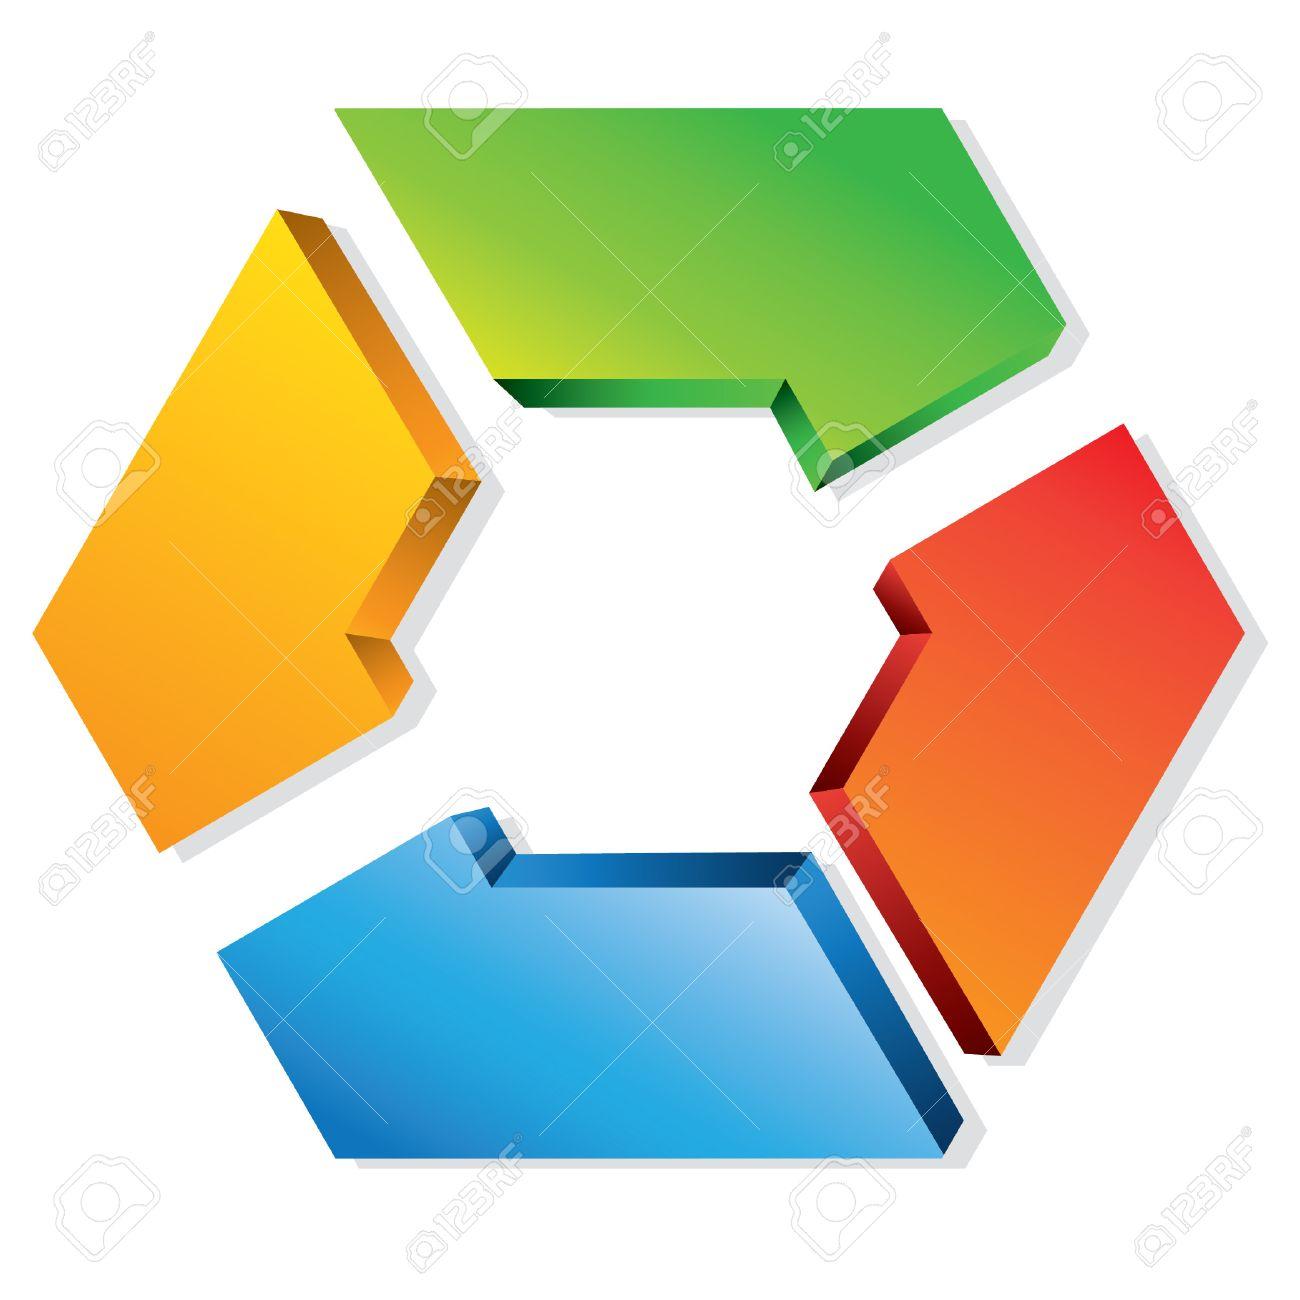 hight resolution of business process flow presentation hexagon loop diagram stock vector 24468320